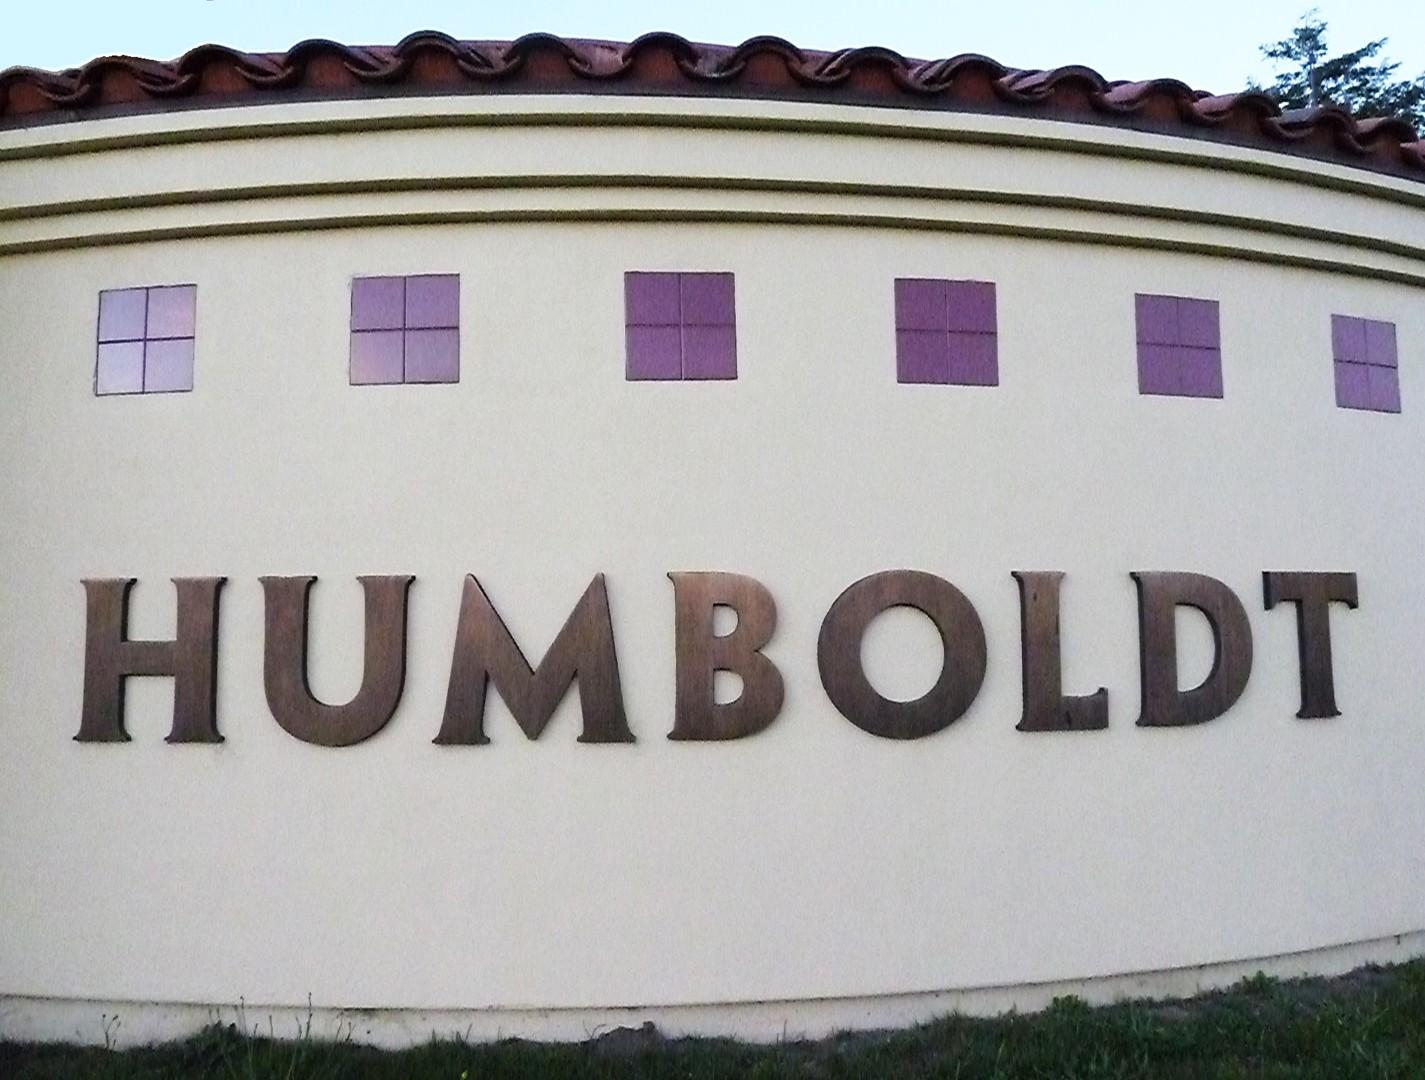 Humboldt - PHOTO BY BOB DORAN